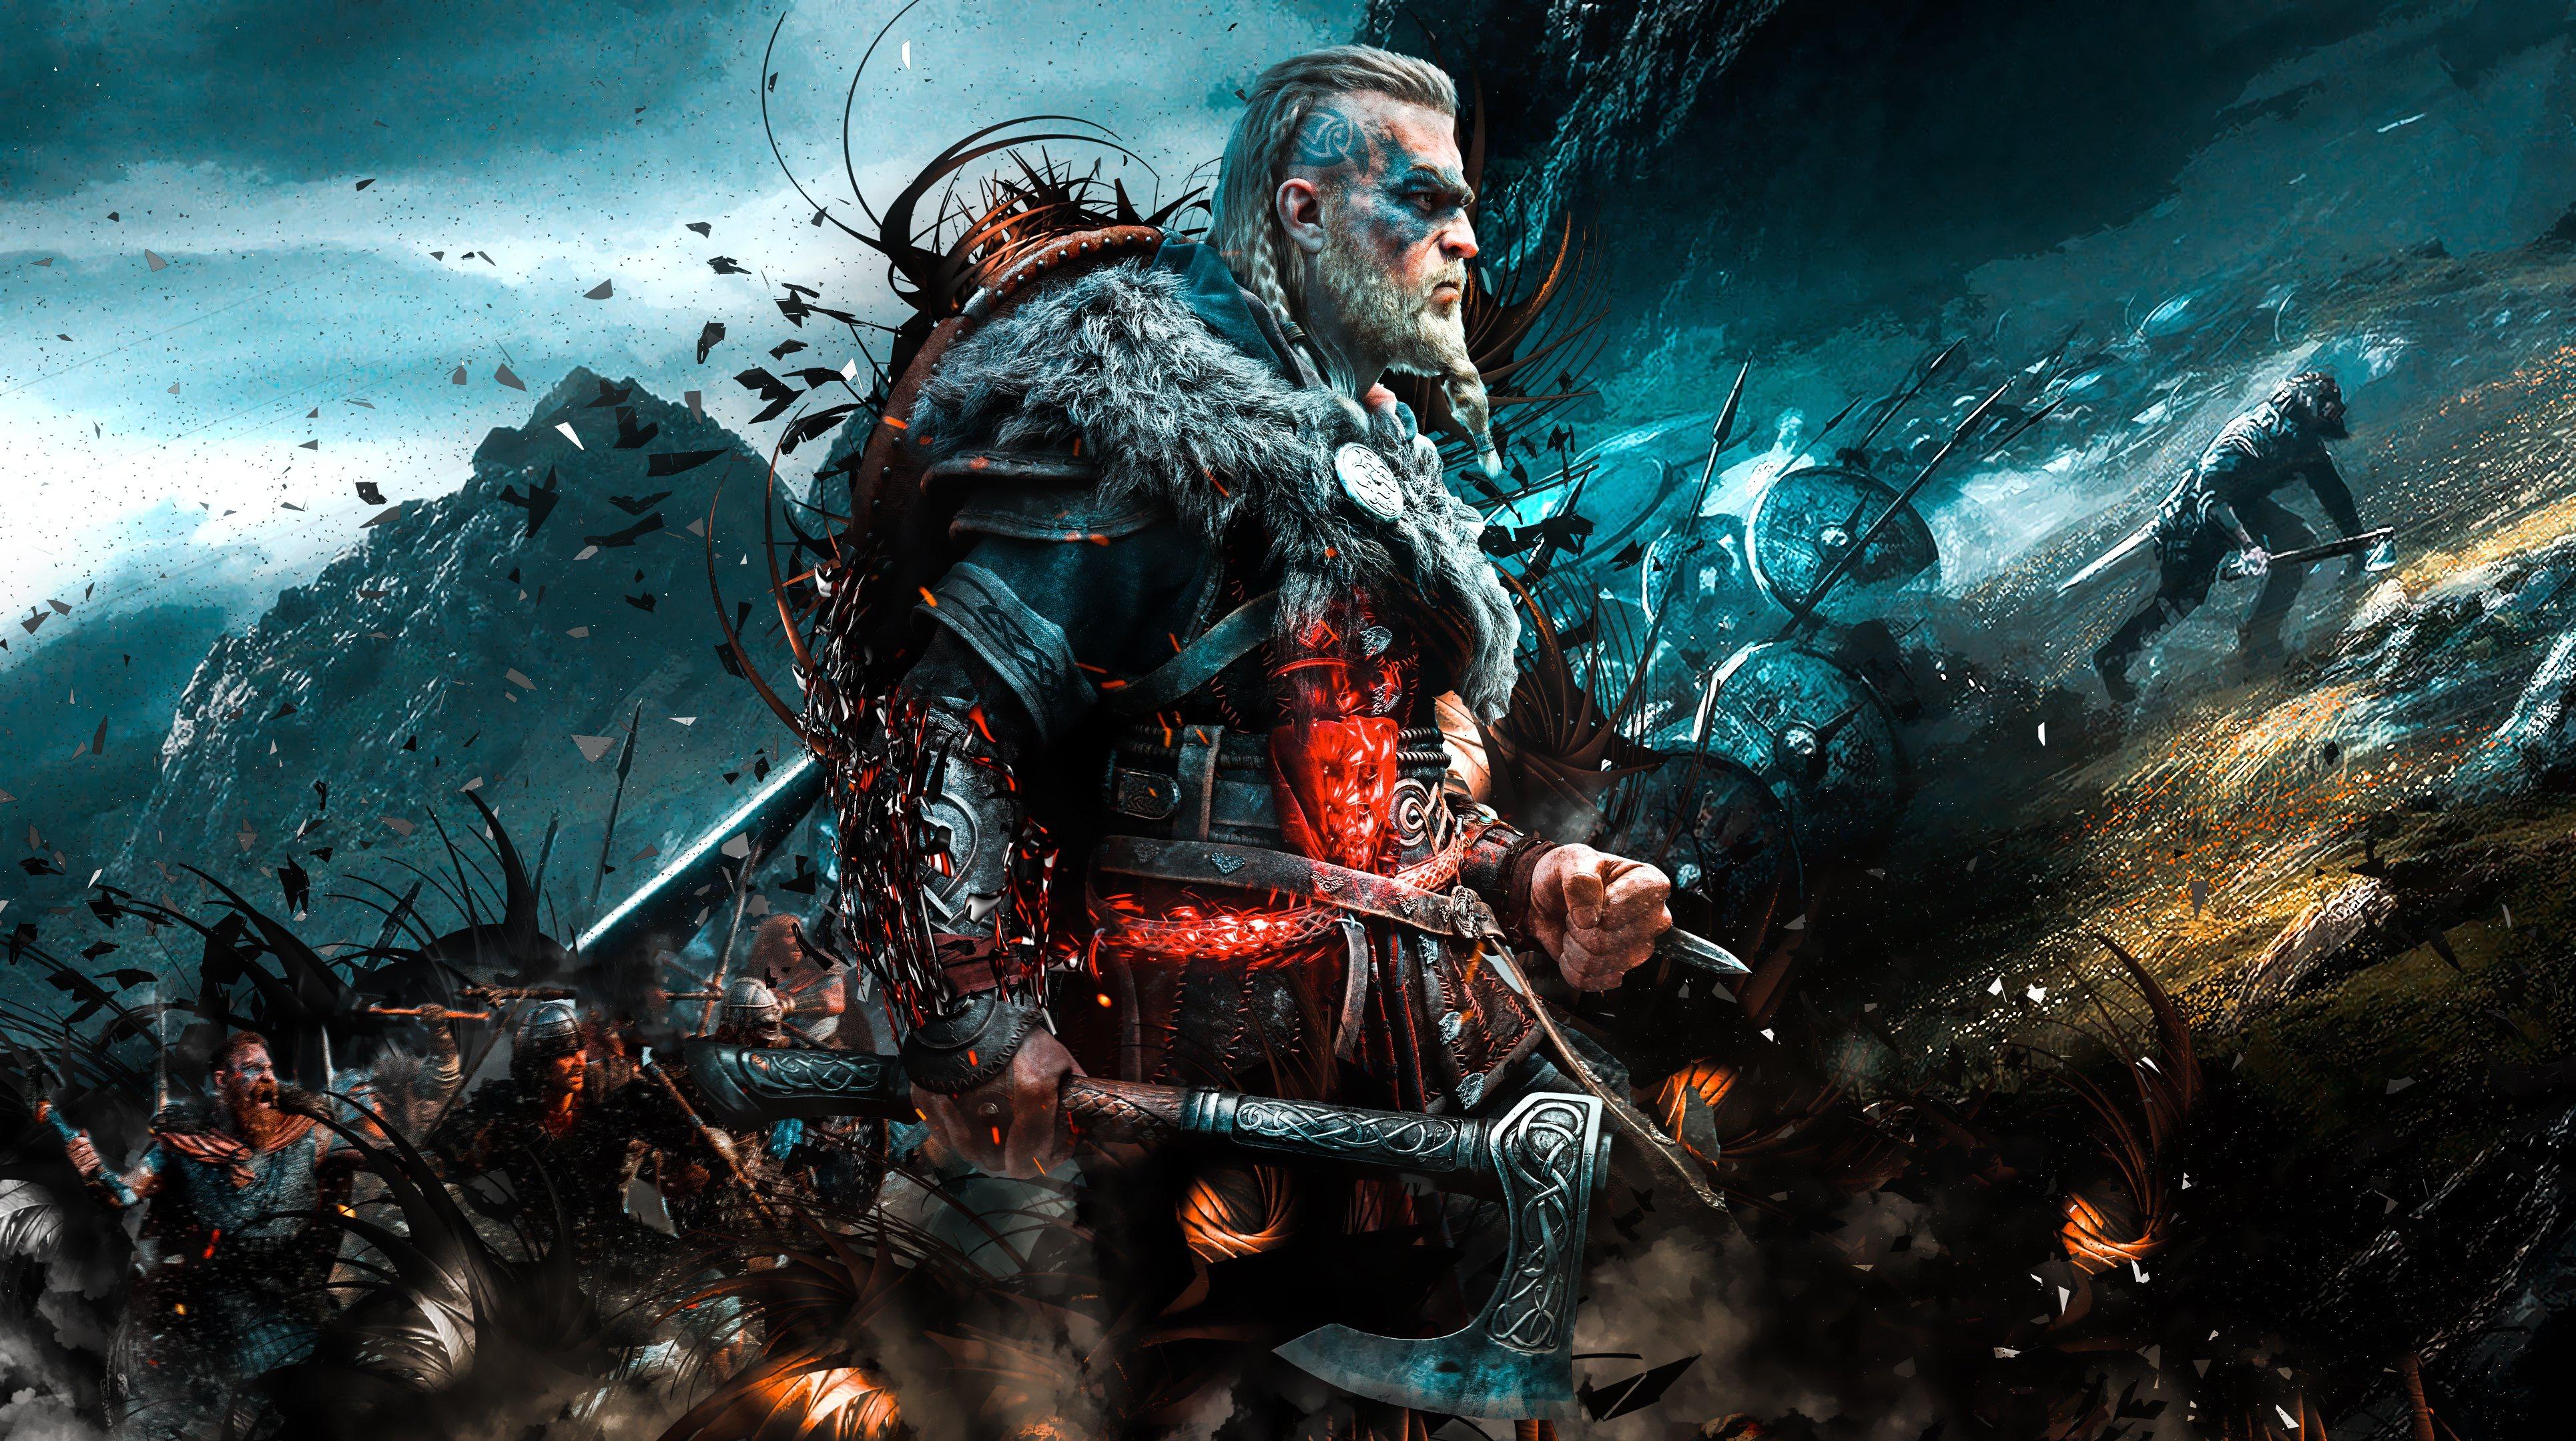 General 3860x2160 Assassin's Creed: Valhalla Assassin's Creed viking Axe video games video game art digital art battle shield cyan